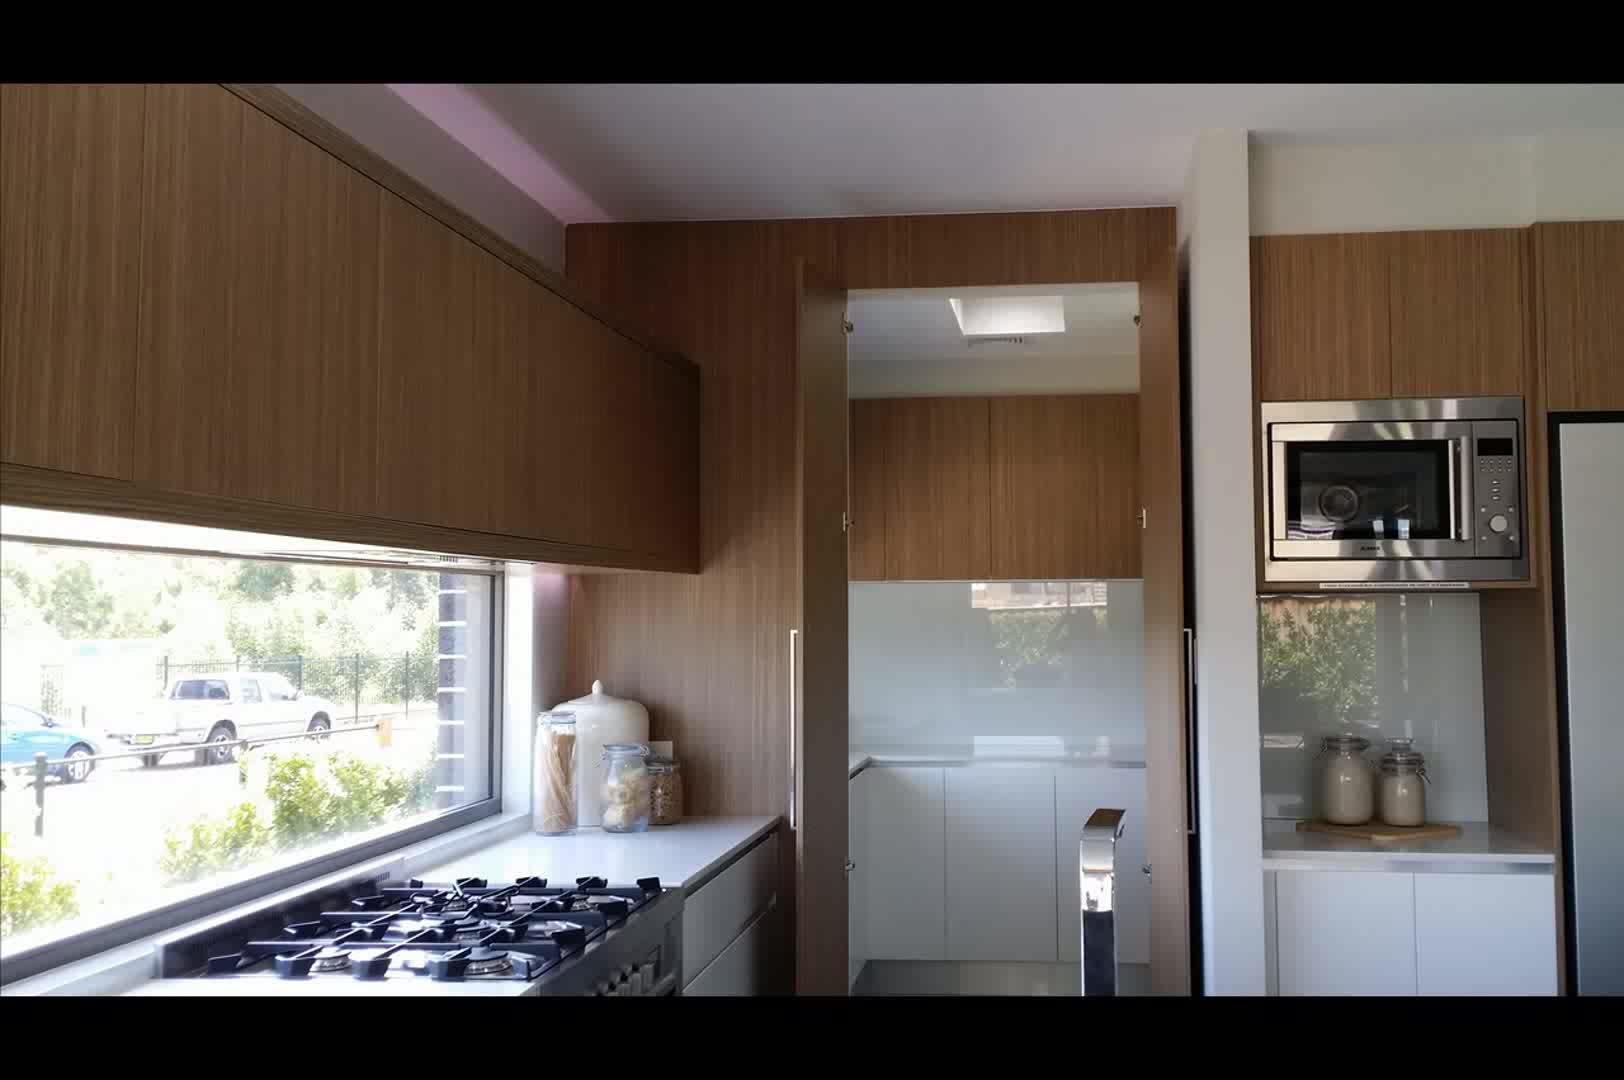 White Gloss Laminated Kitchen Cabinet Doors Melamine Faced Mdf